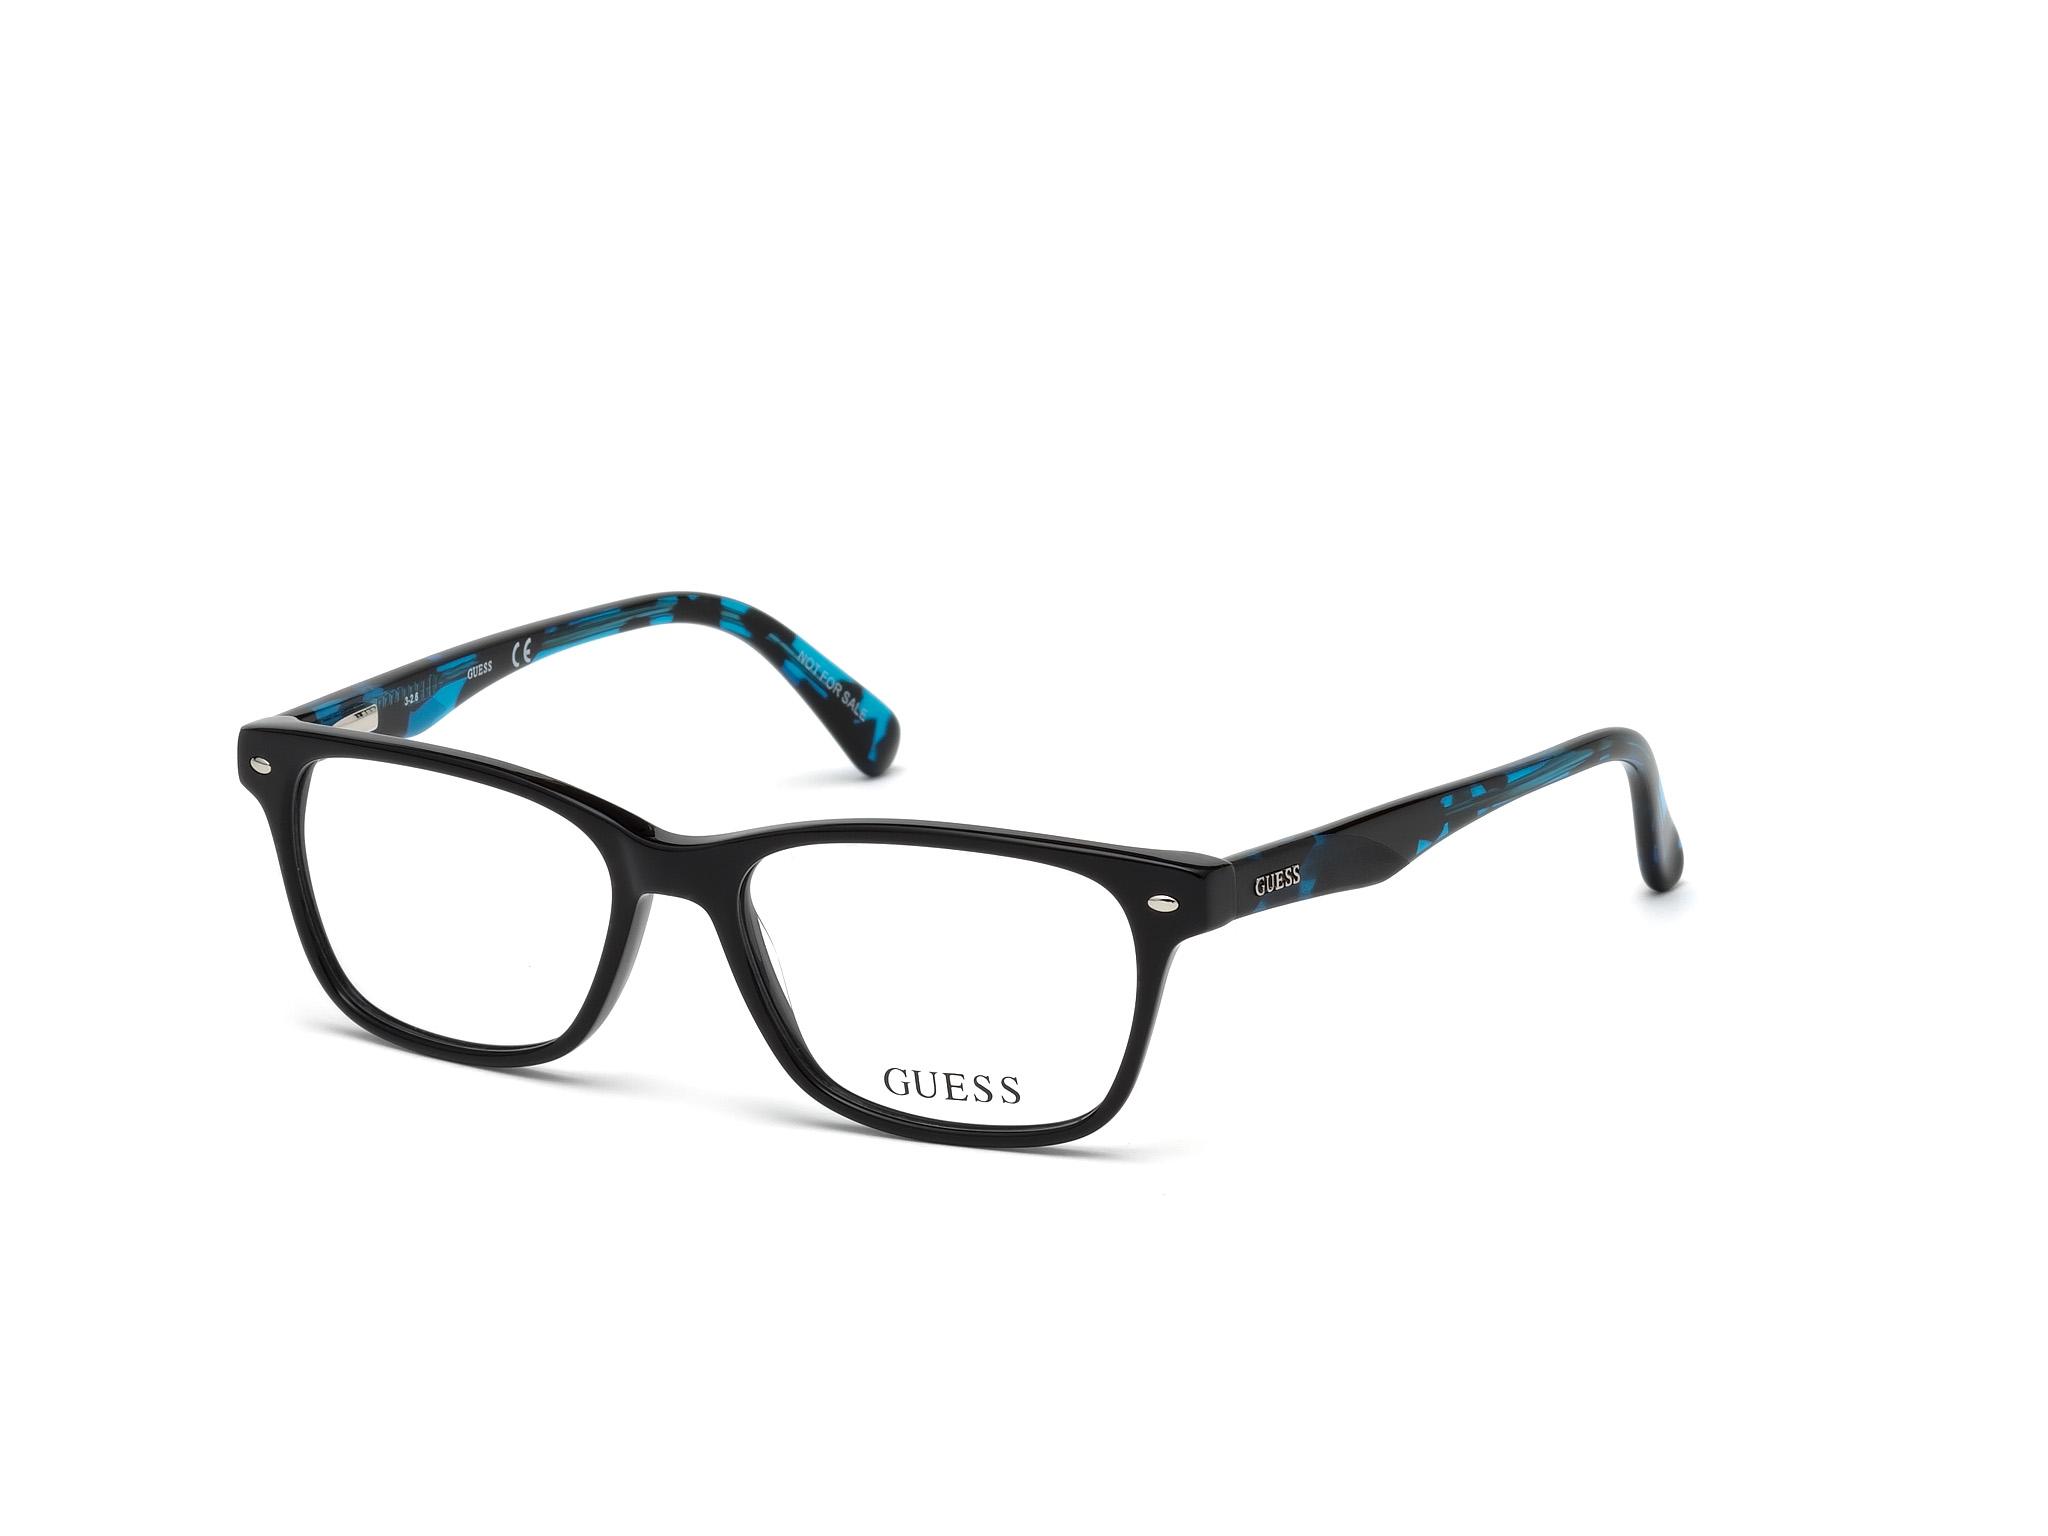 e0cd197f046 Guess Kids GU9172 Eyeglasses Shiny Black 001 Guess GU9172 001 - Optiwow